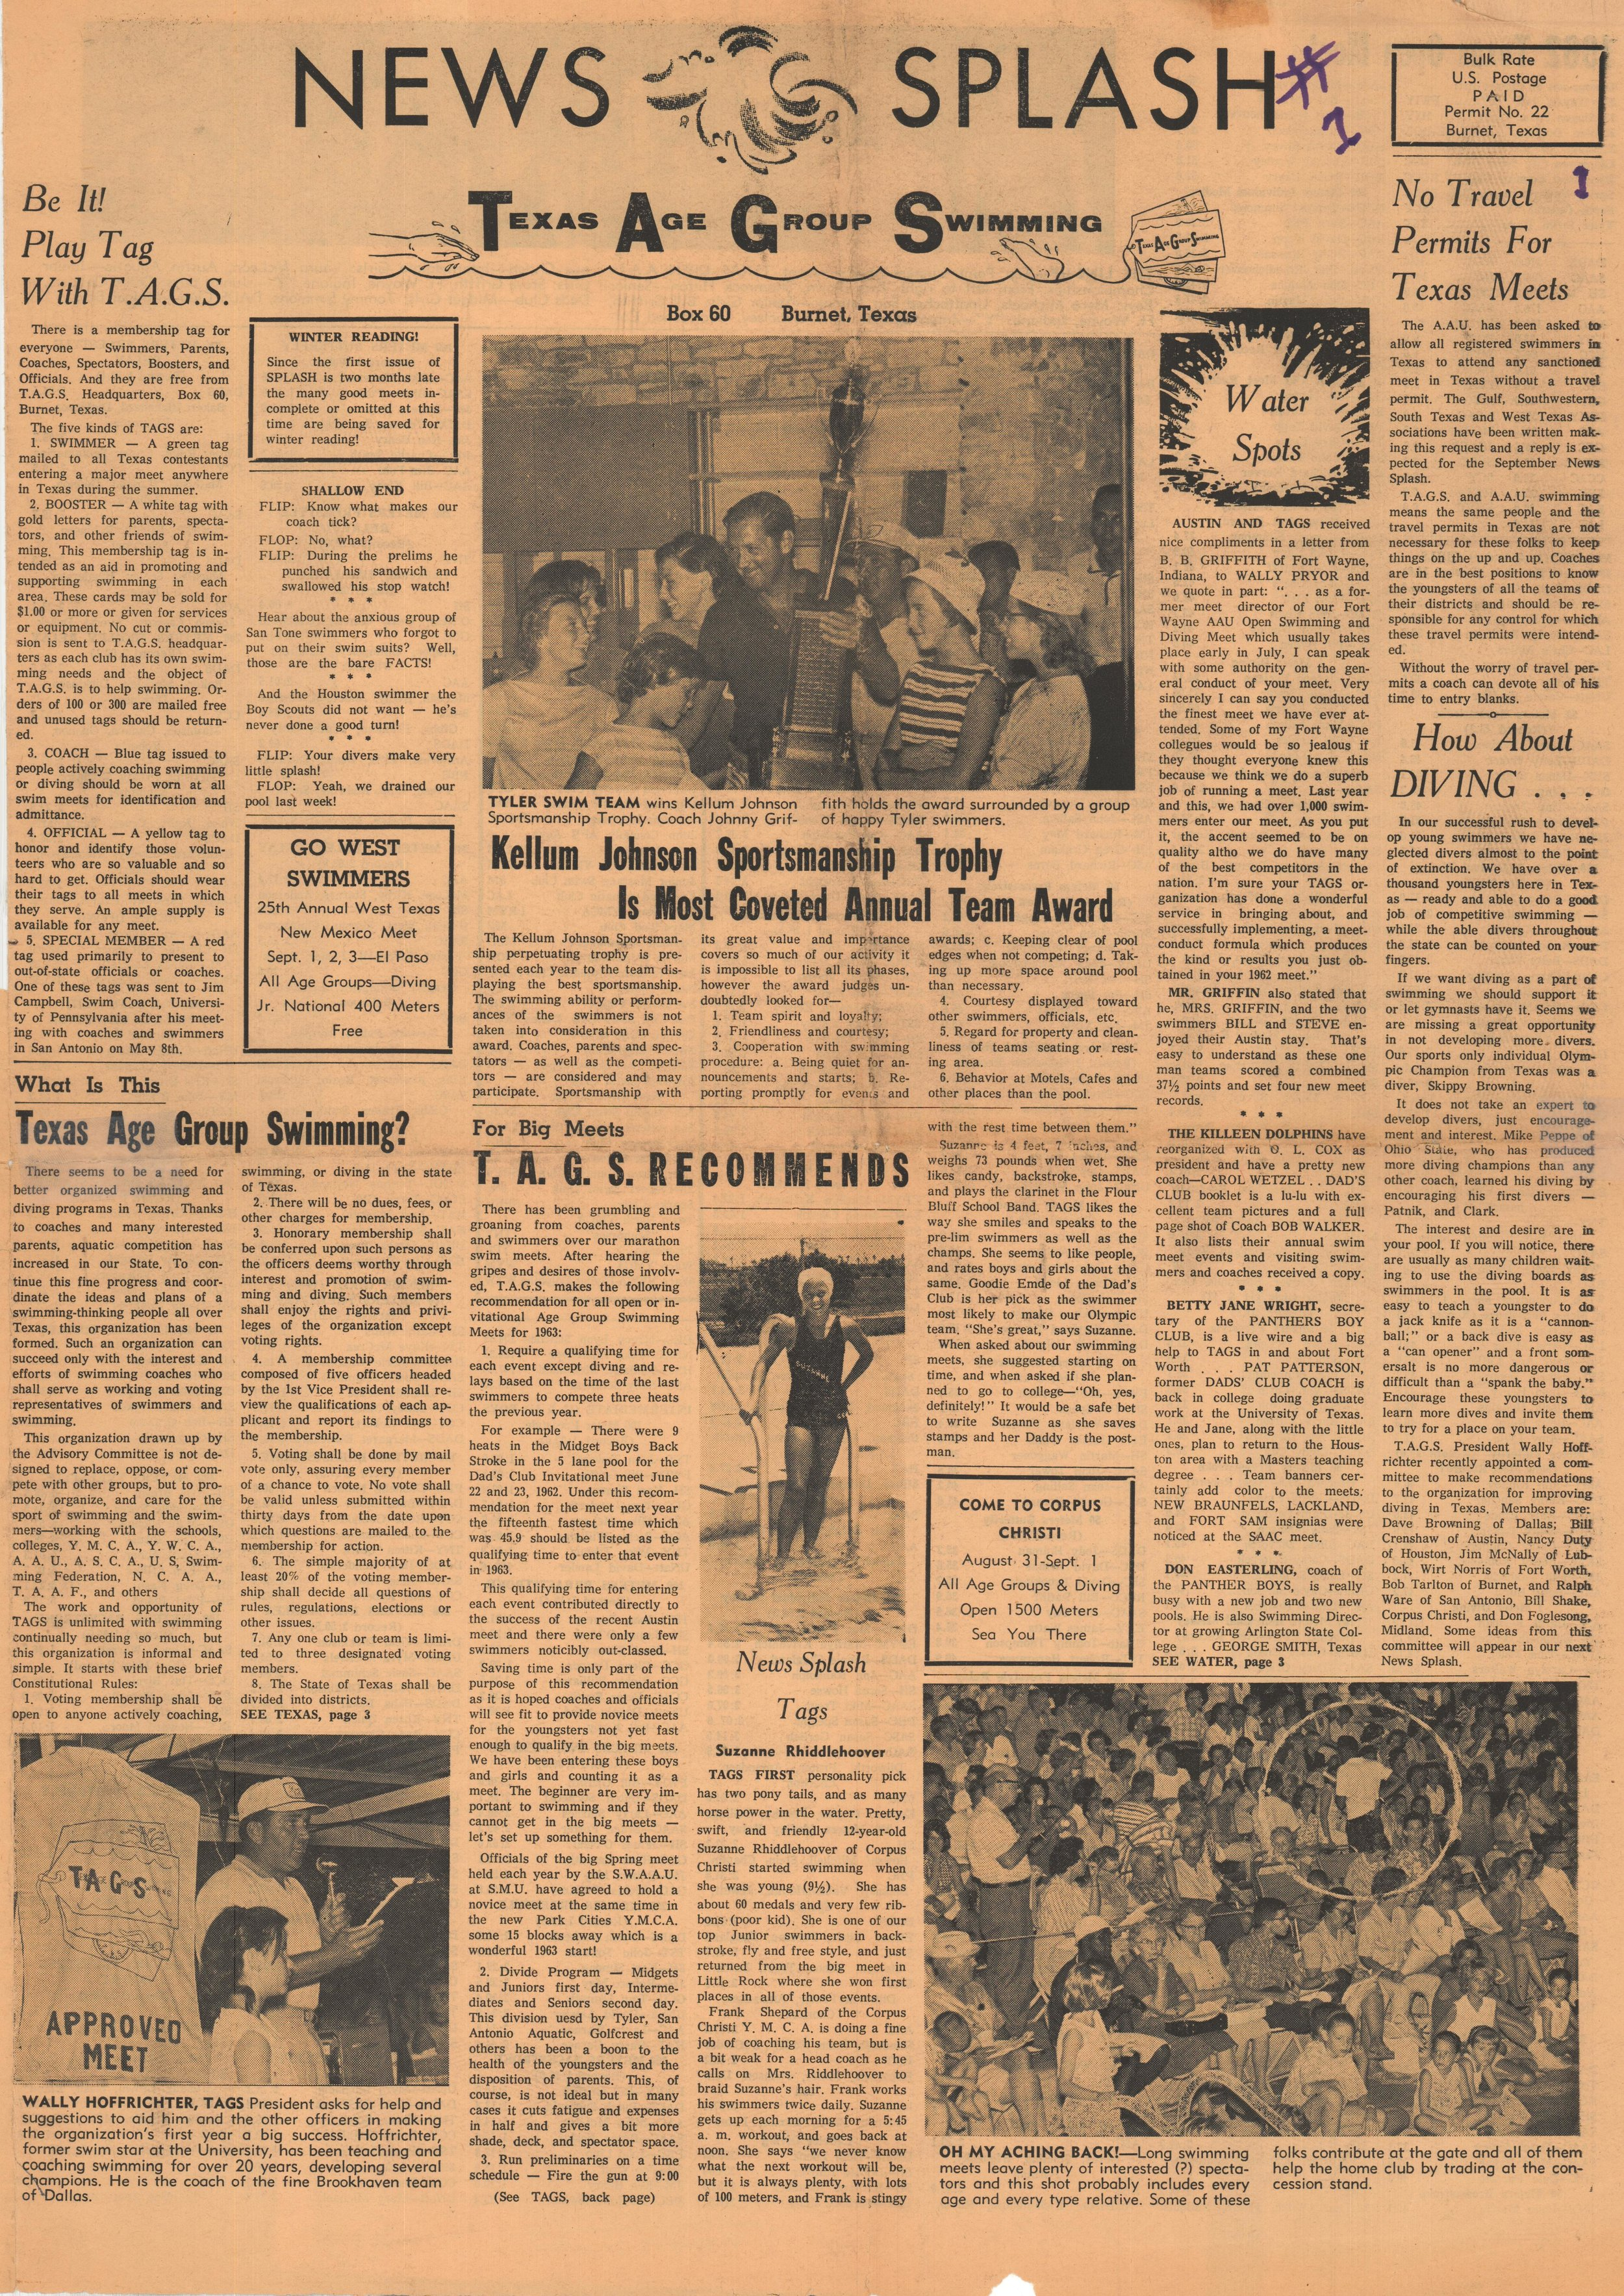 1962 Vol. 1 pg 1.jpg